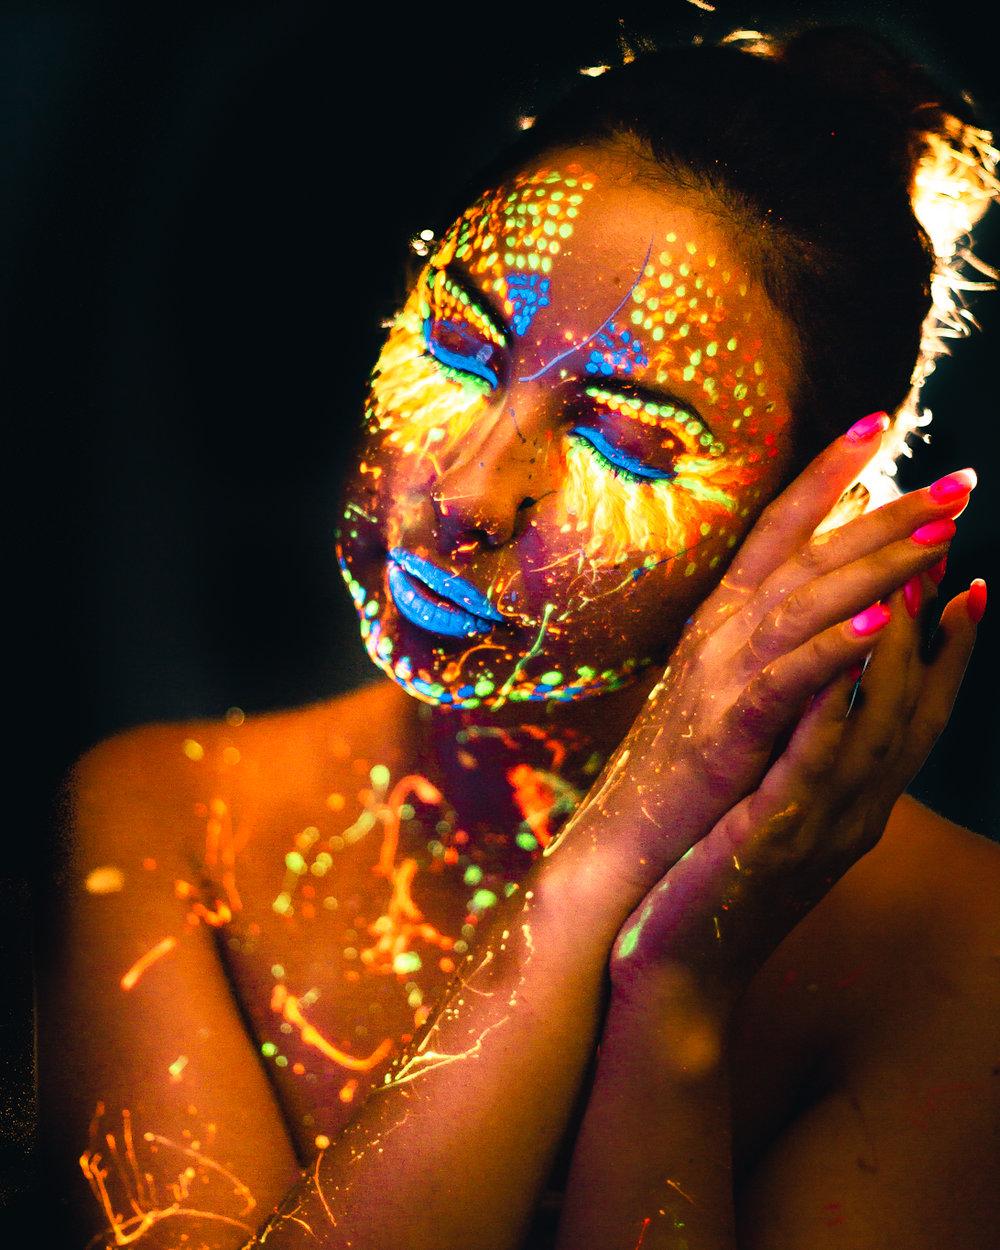 UV portrait photography